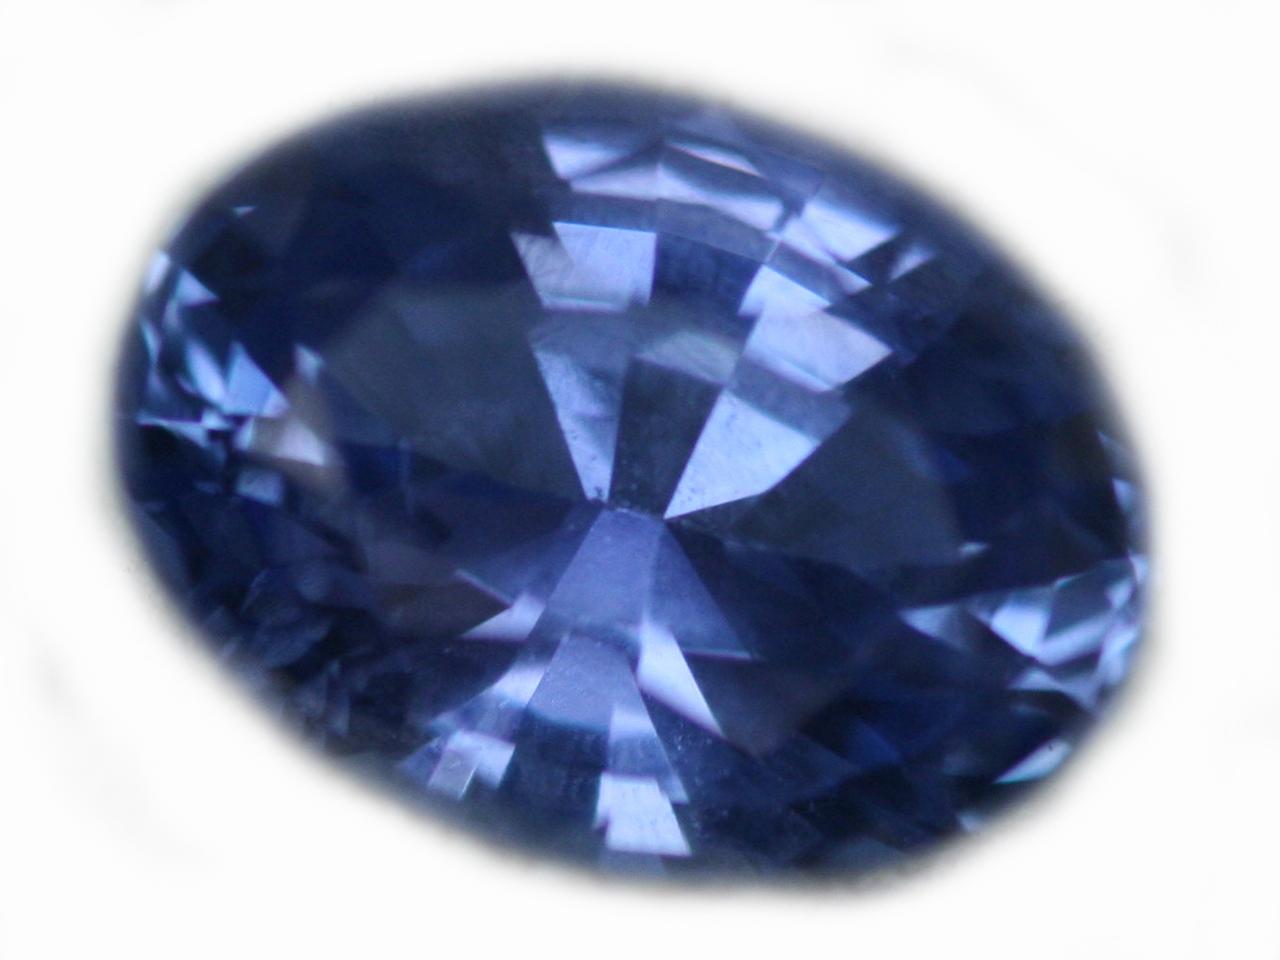 Ceylon Blue Oval Cut Sapphire - 0.99 Cts - 7x5x3.5mm